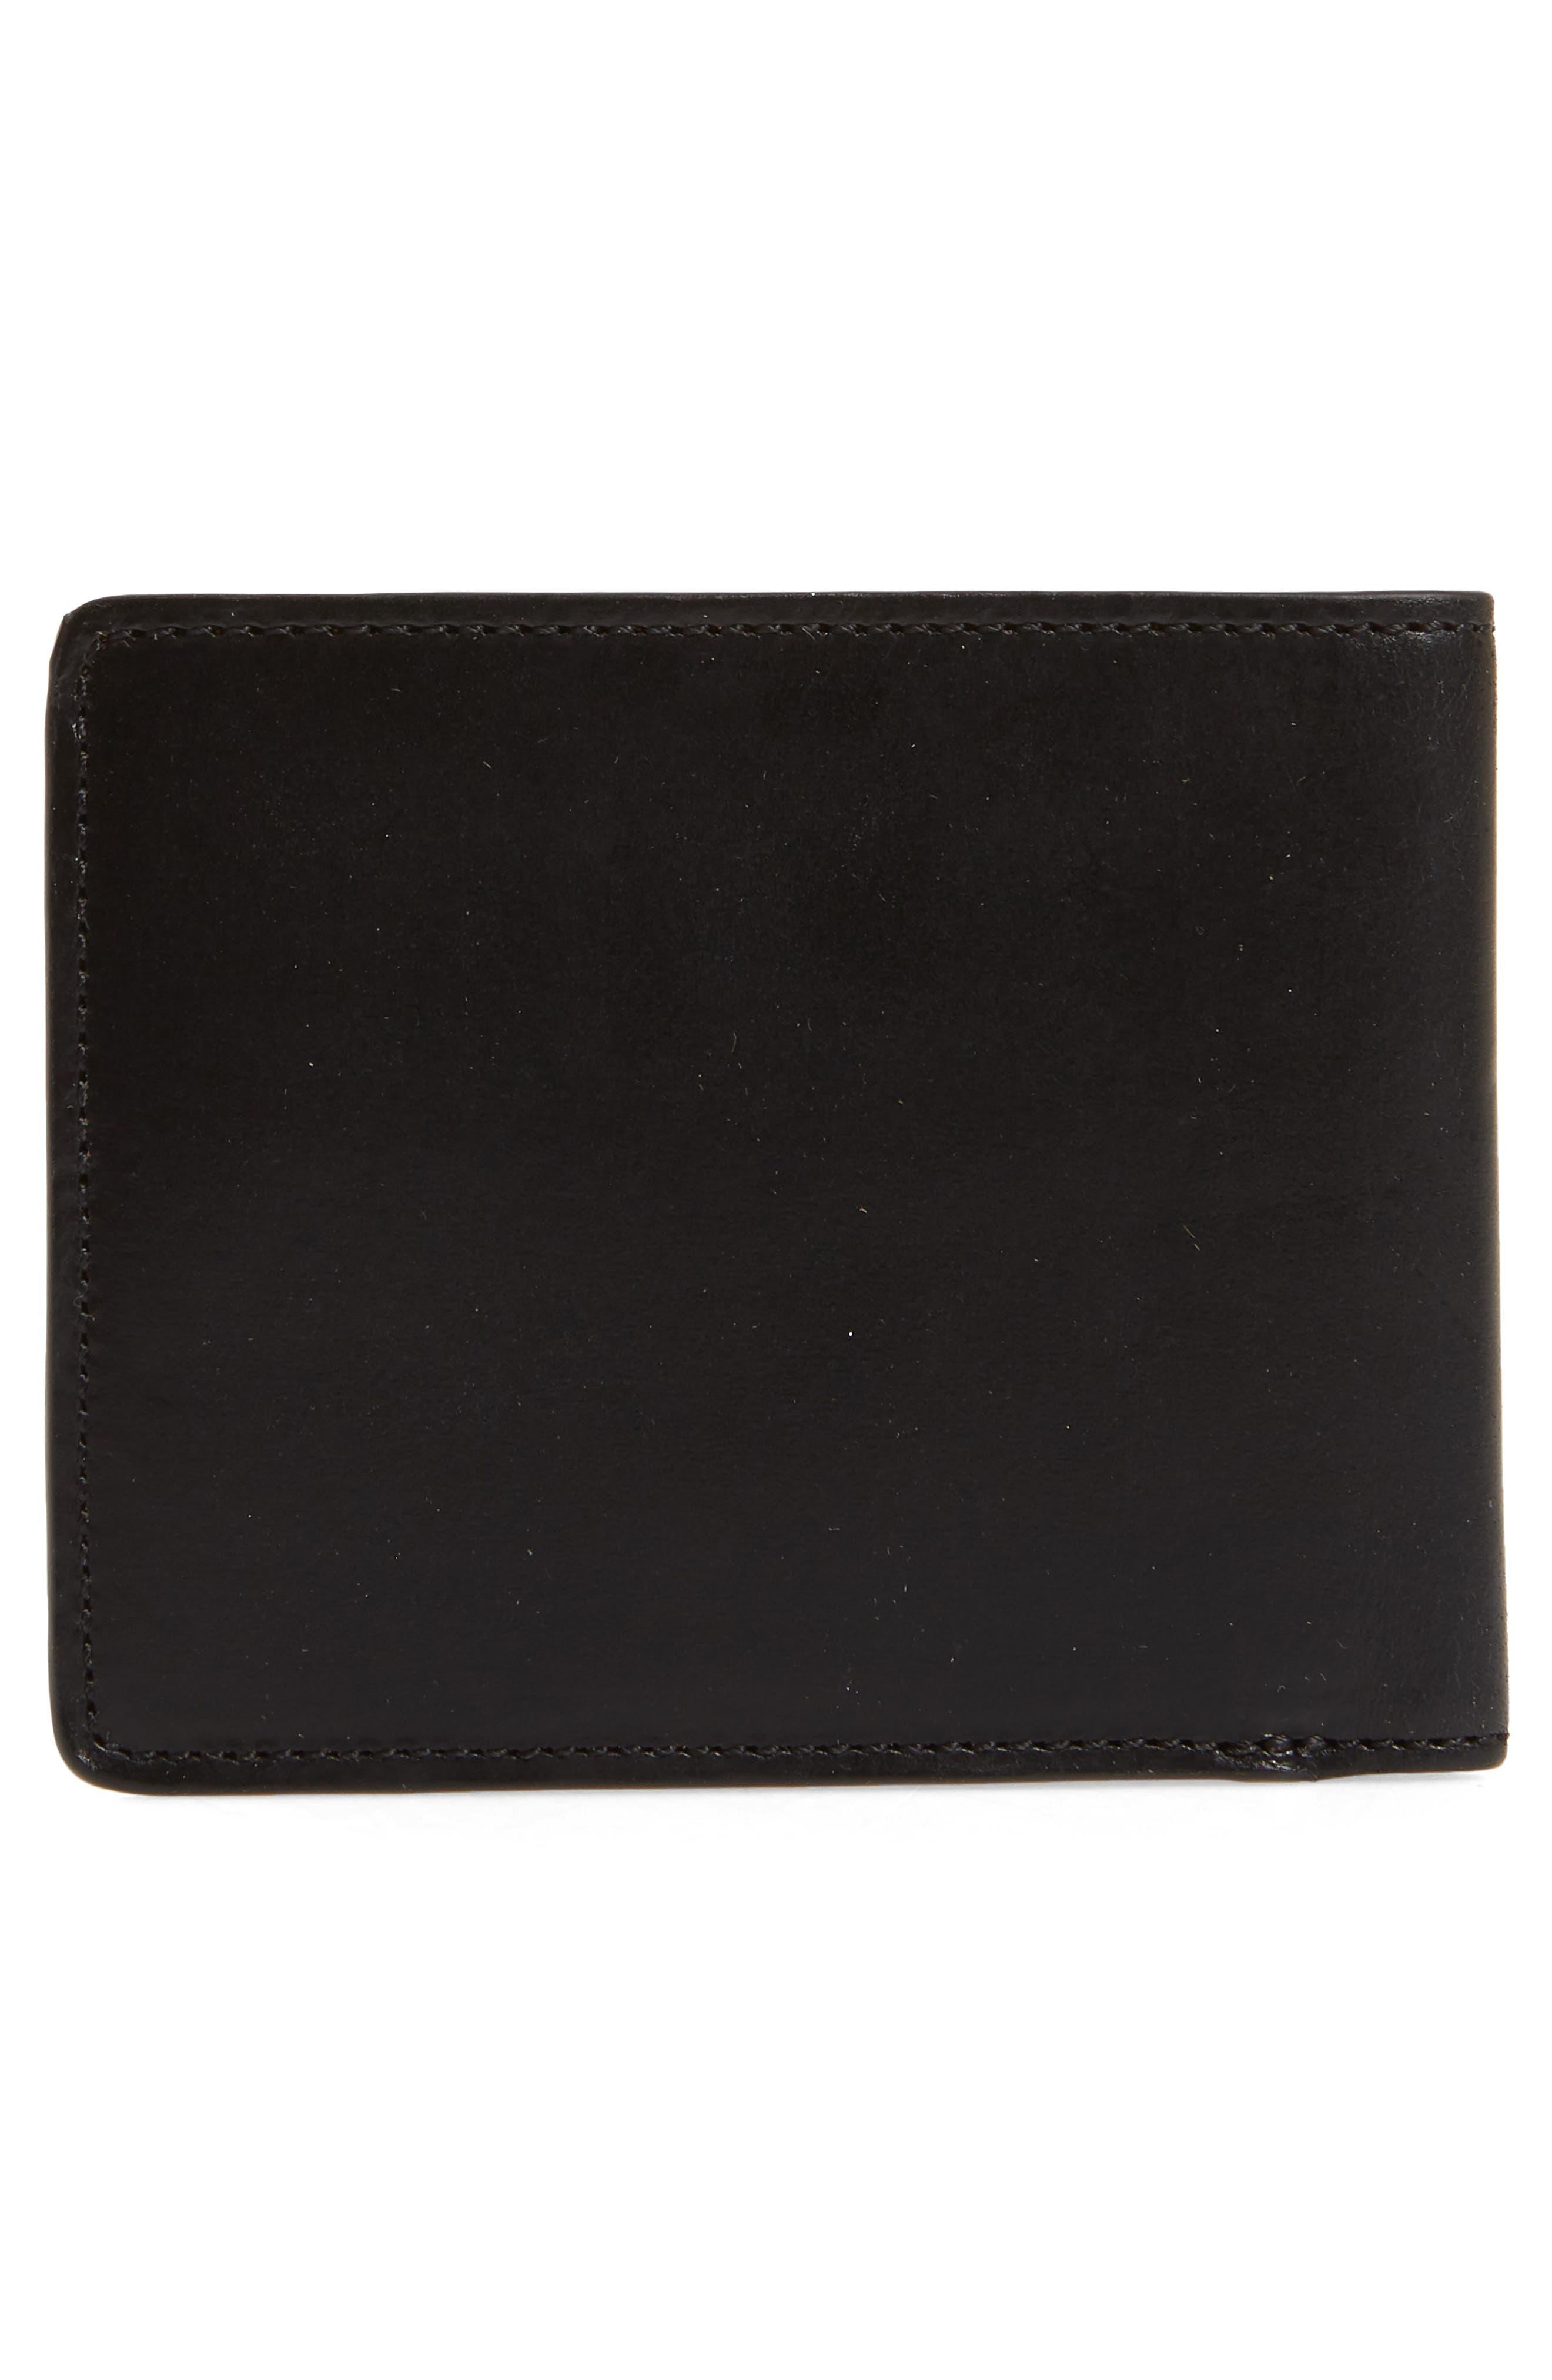 Darien Leather Wallet,                             Alternate thumbnail 3, color,                             Black